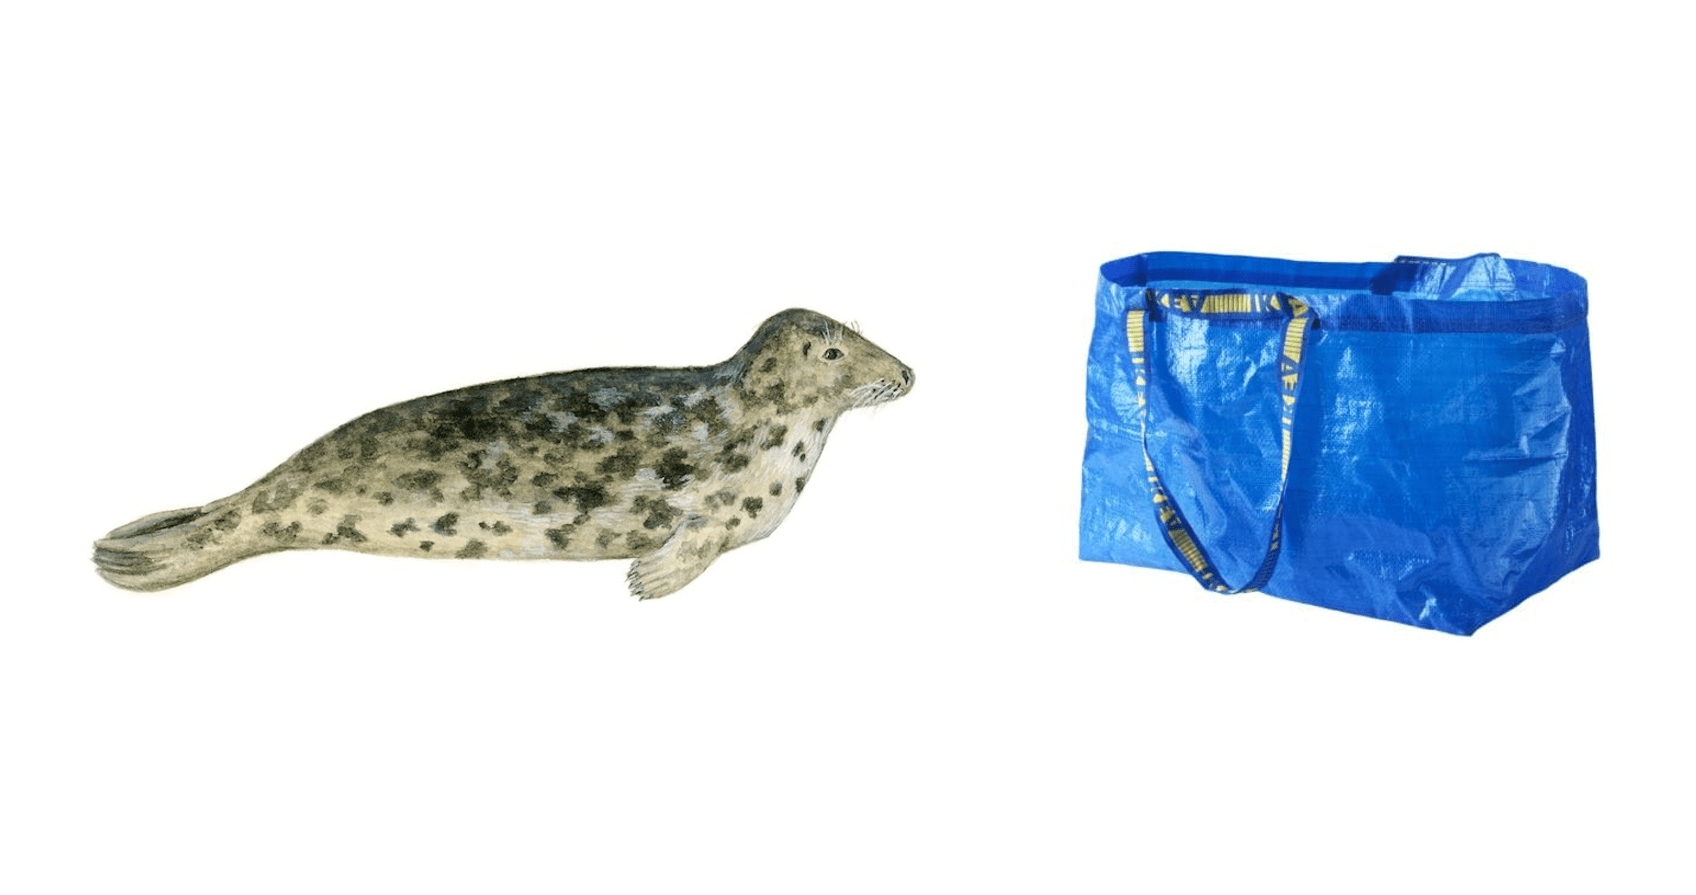 Skansen: Säl vs Ikeapåse